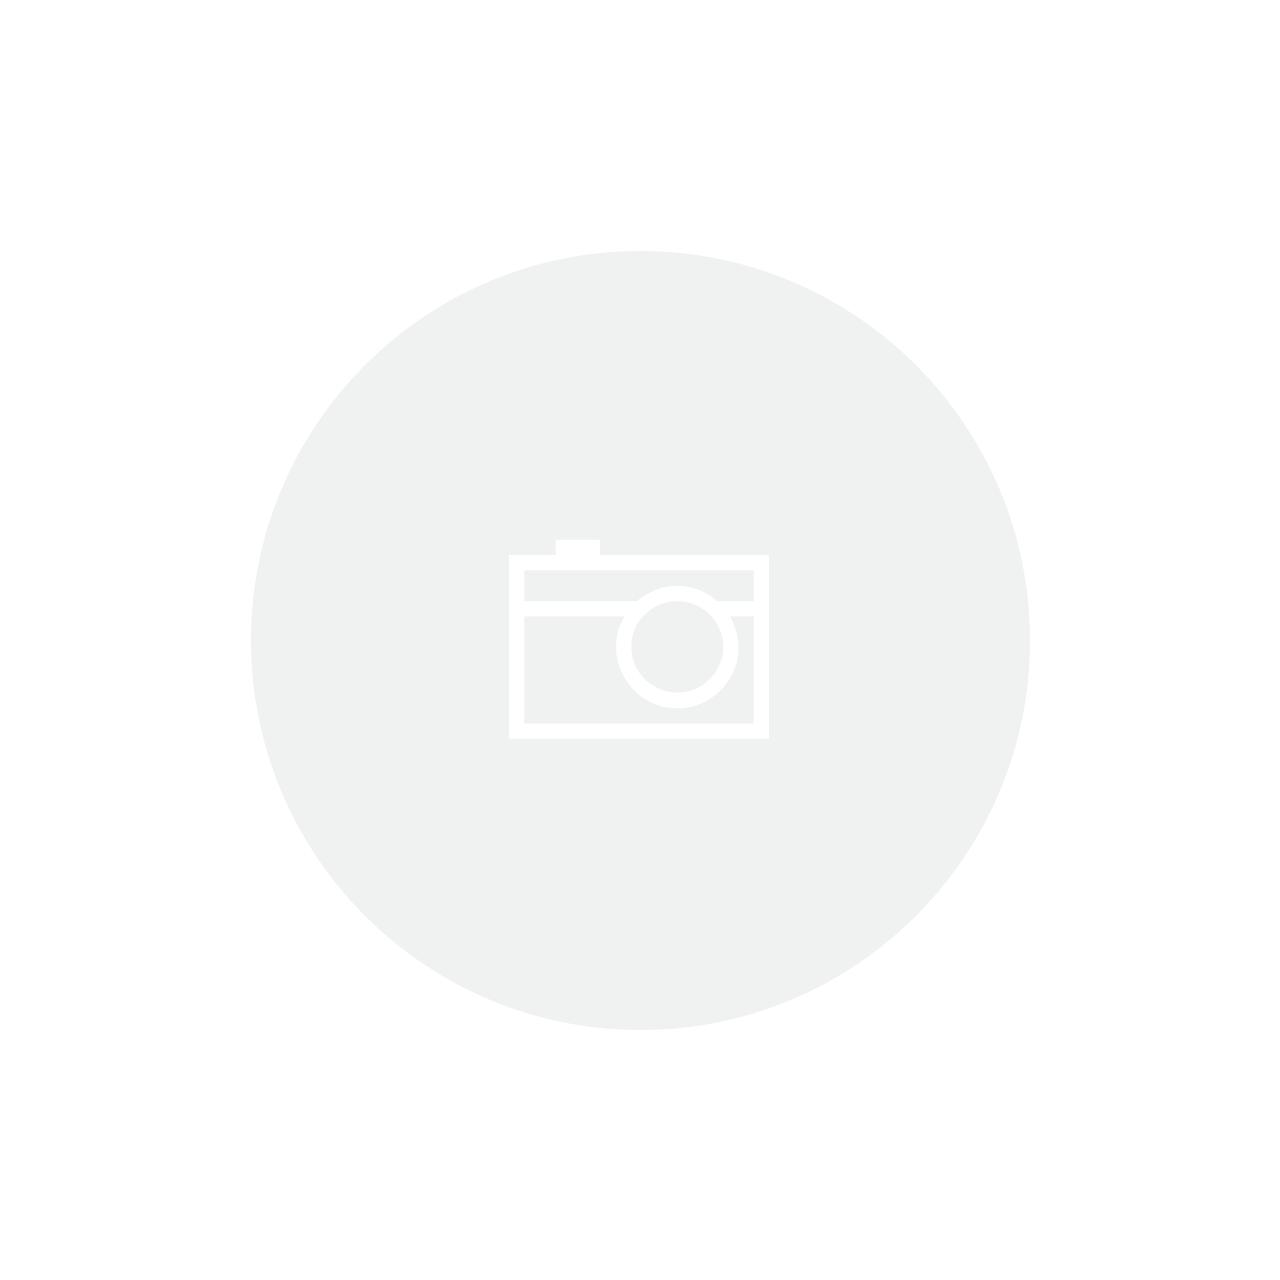 Papel Artesanal Indiano - Ref. 81